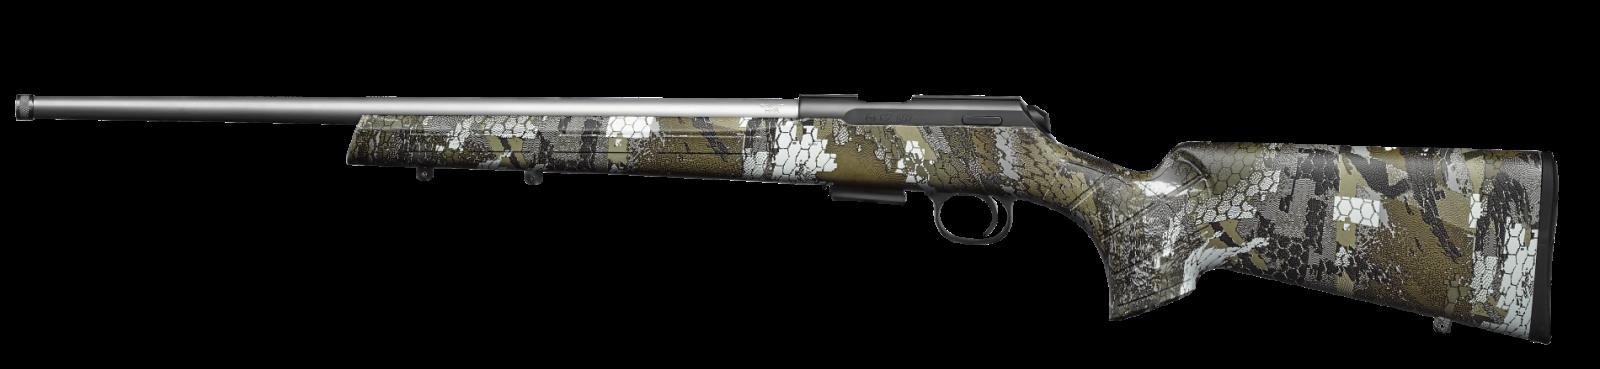 "Carabine CZ 457 Stainless Camo 20"" Cal. 22lr"